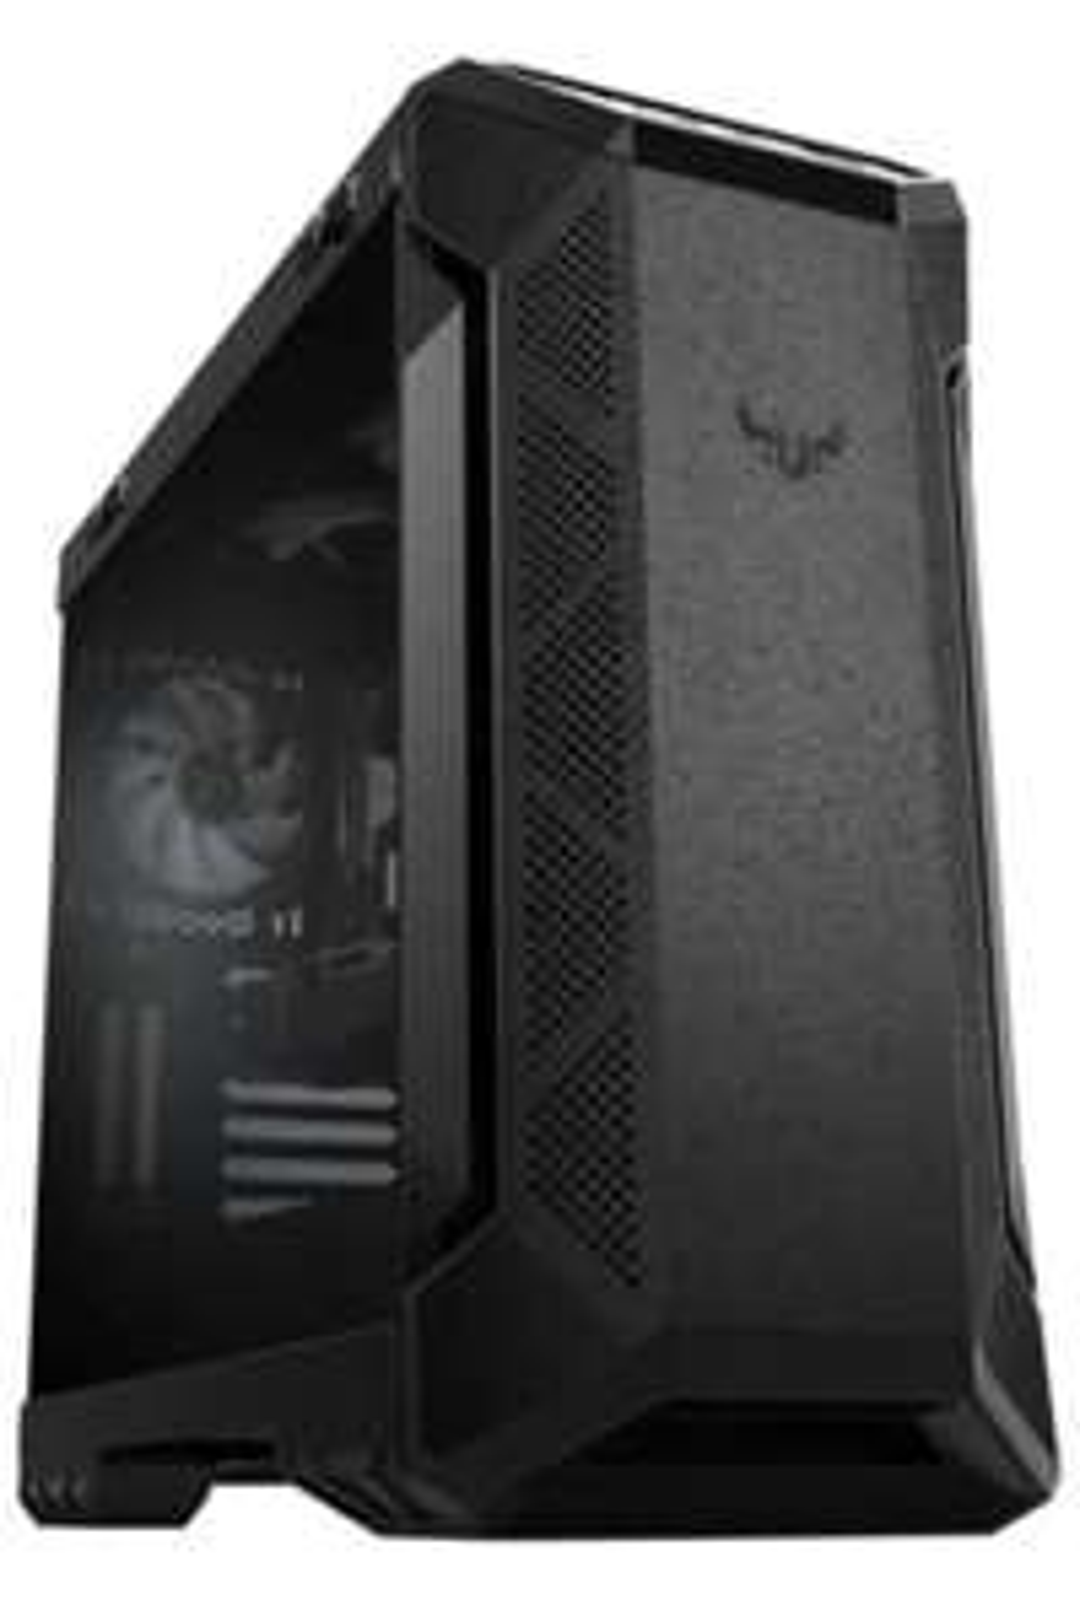 ASUS TUF GT501 Gaming Gehäuse (bis zu E-ATX, 120mm RGB-Lüfter, 140mm PWM-Lüfter, USB 3.1 Gen 1) schwarz